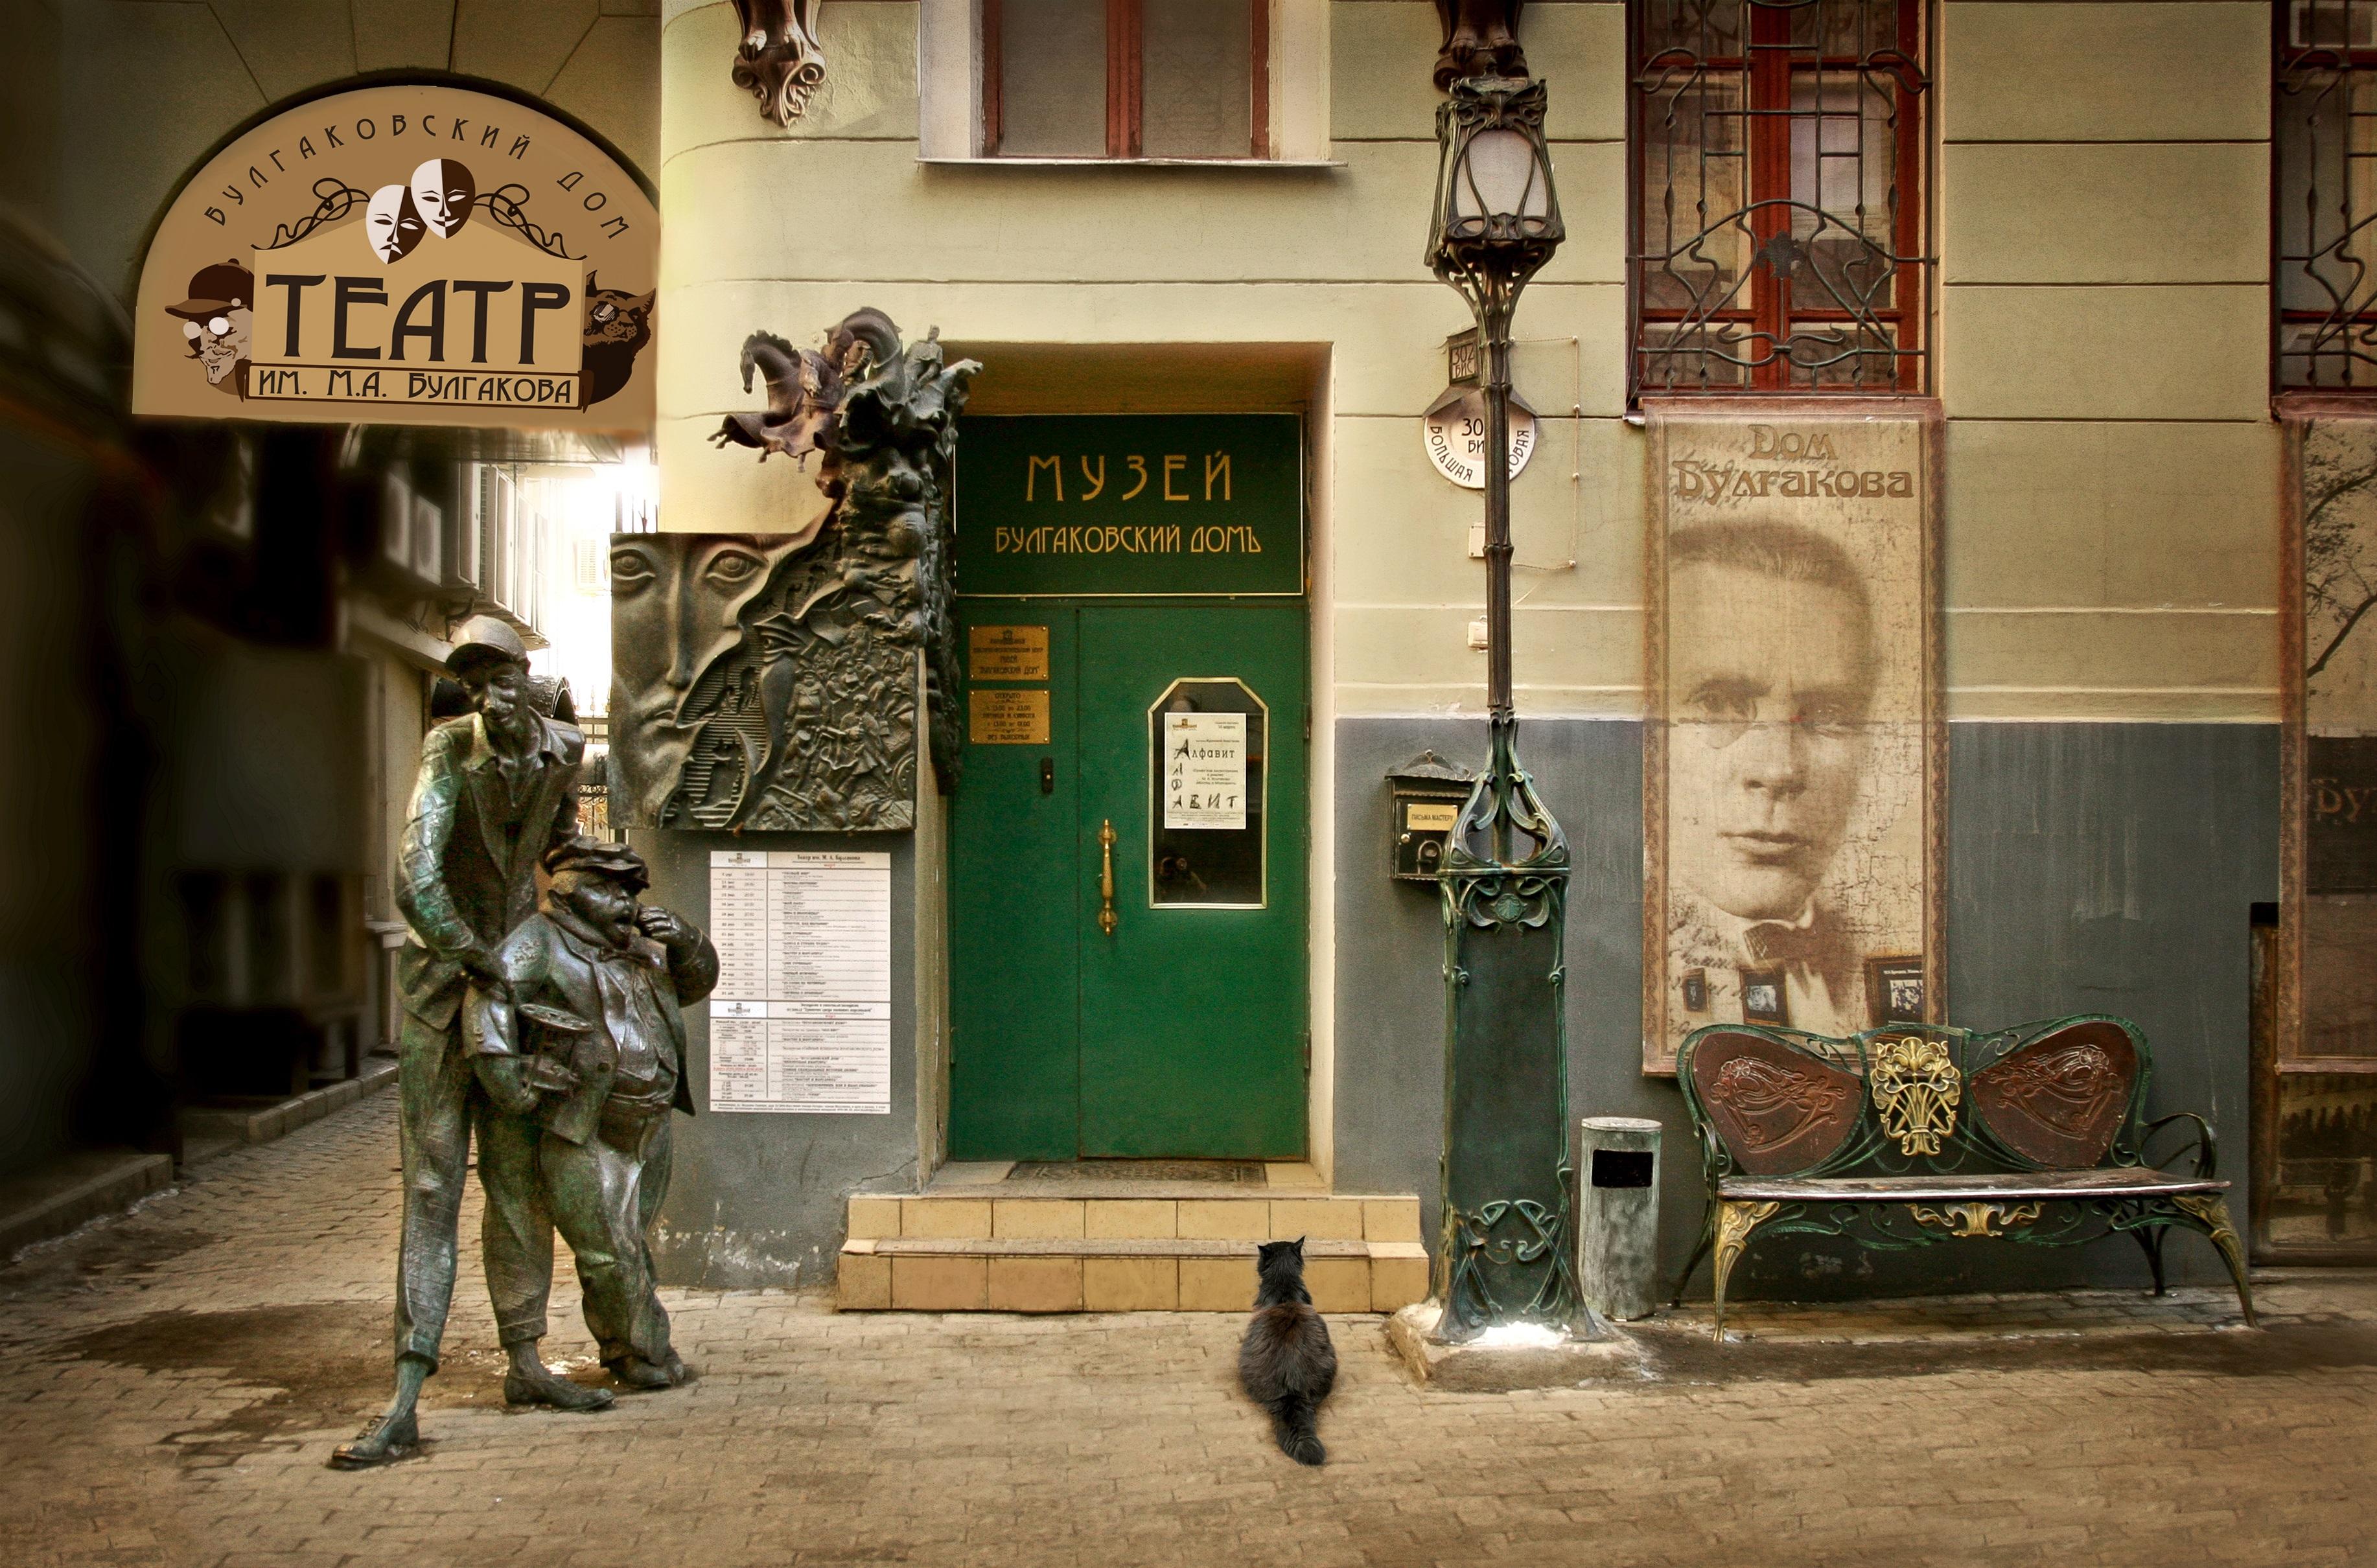 Вход в музей-театр «Булгаковский дом»